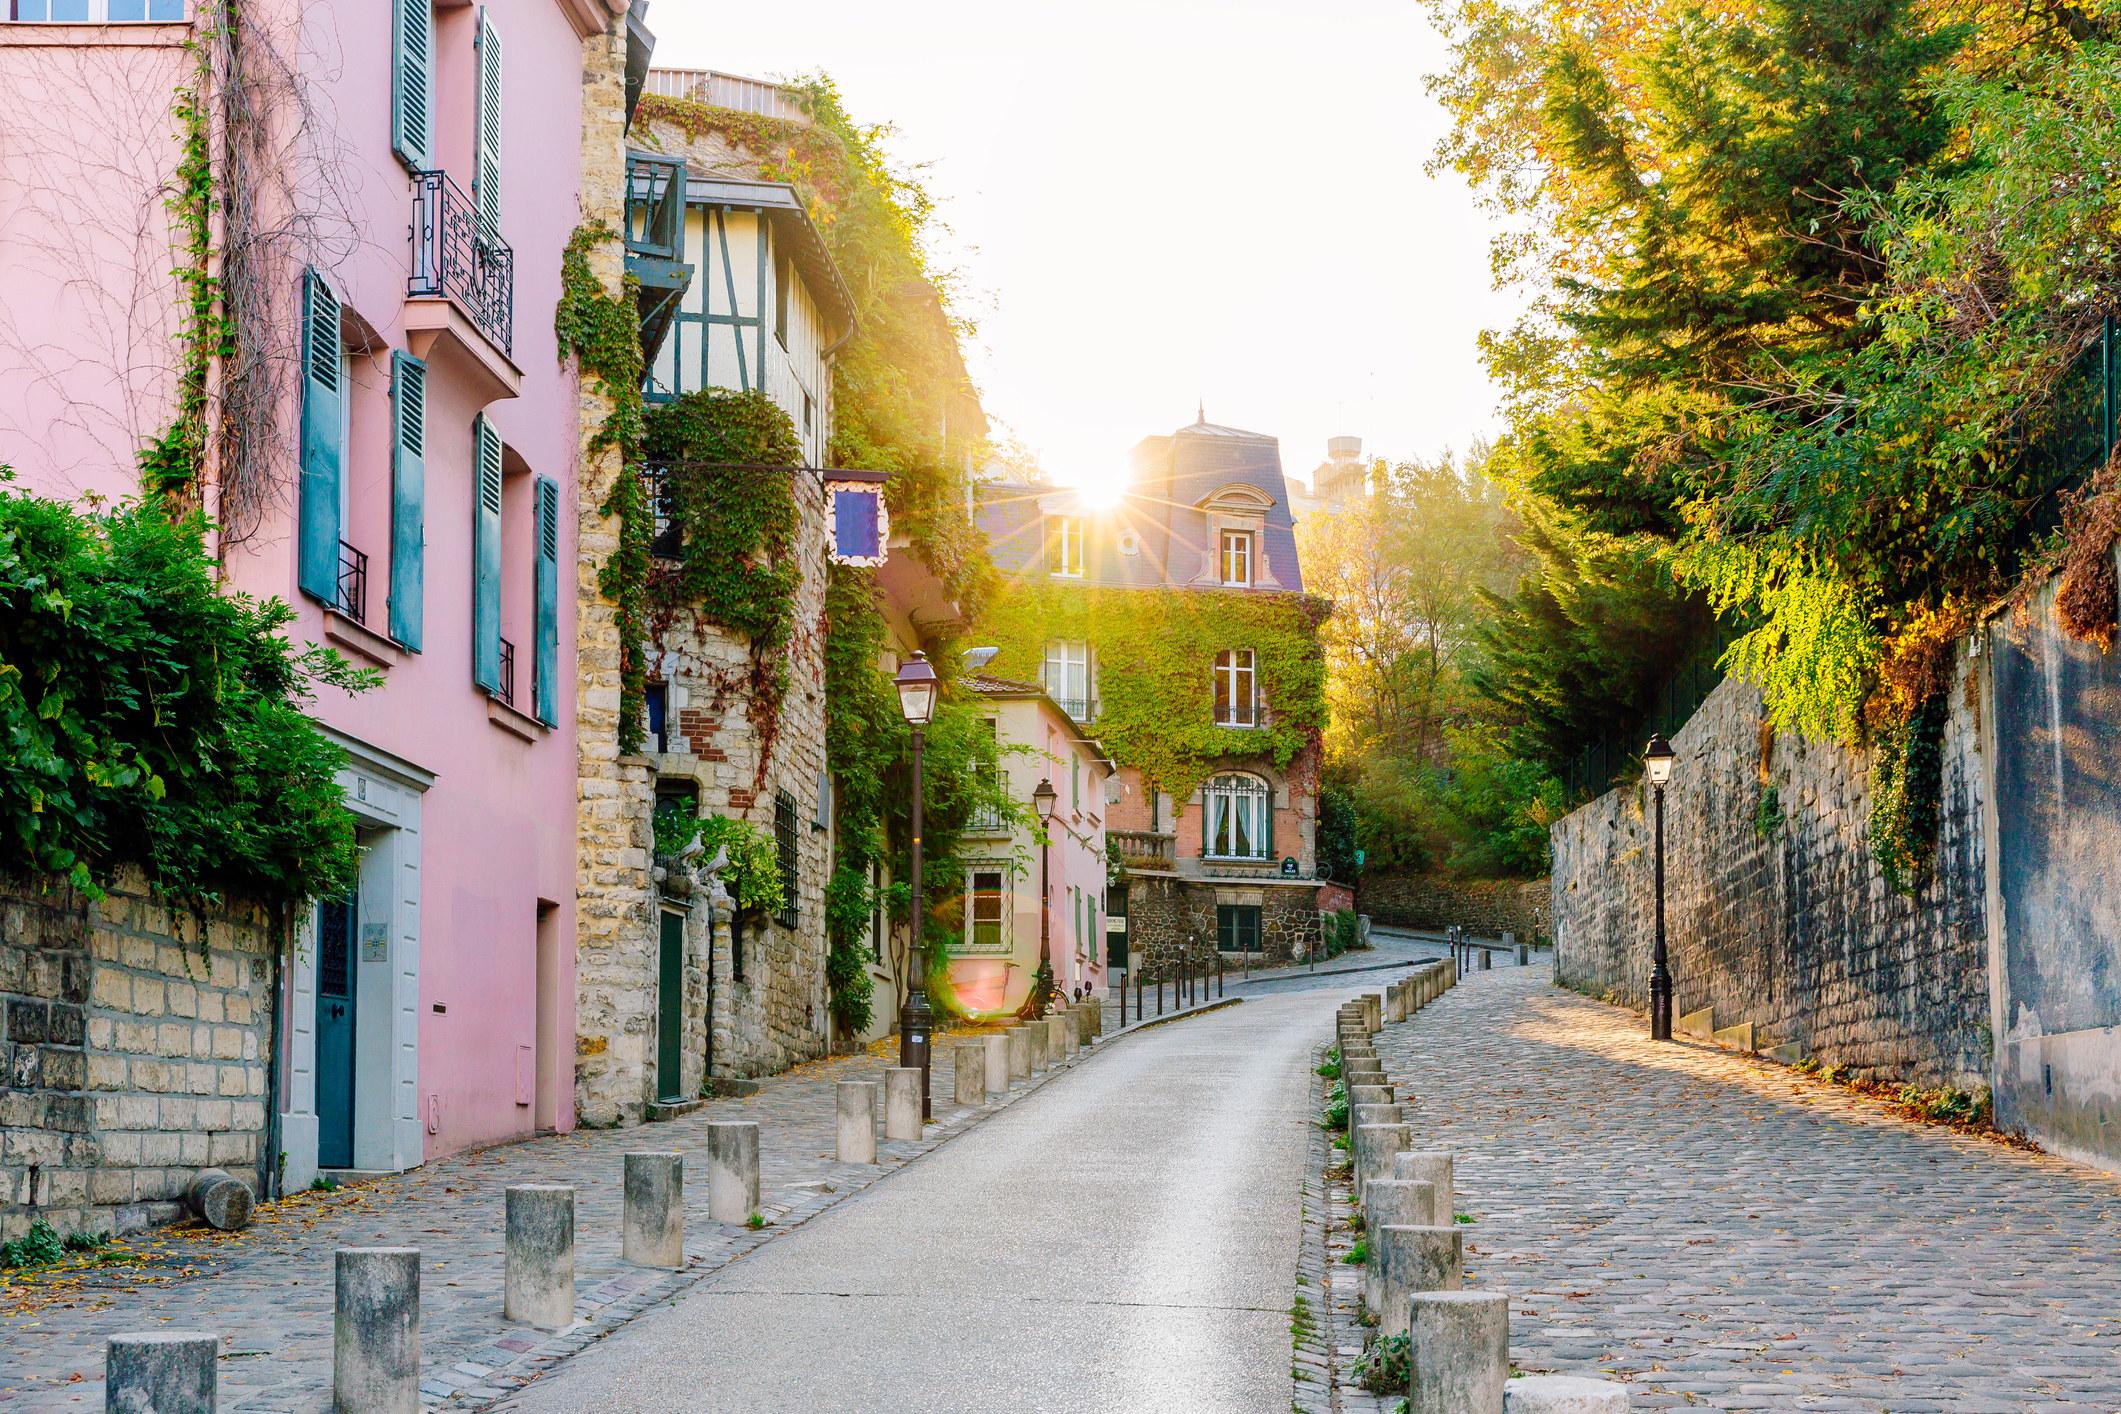 A quiet street in Paris.